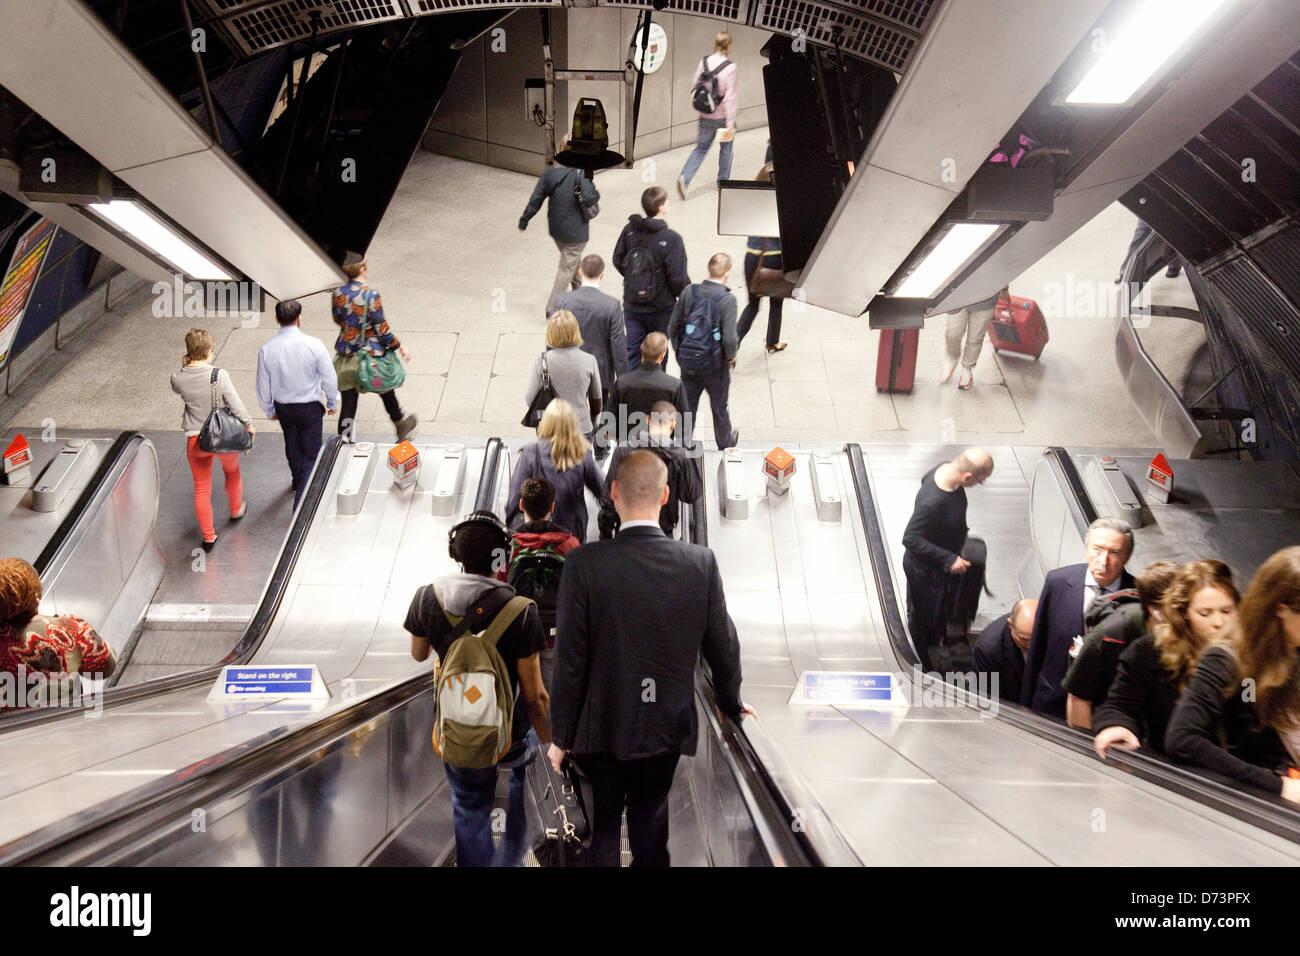 Commuters commuting to work on the London underground escalators, London Bridge Station, London UK - Stock Image